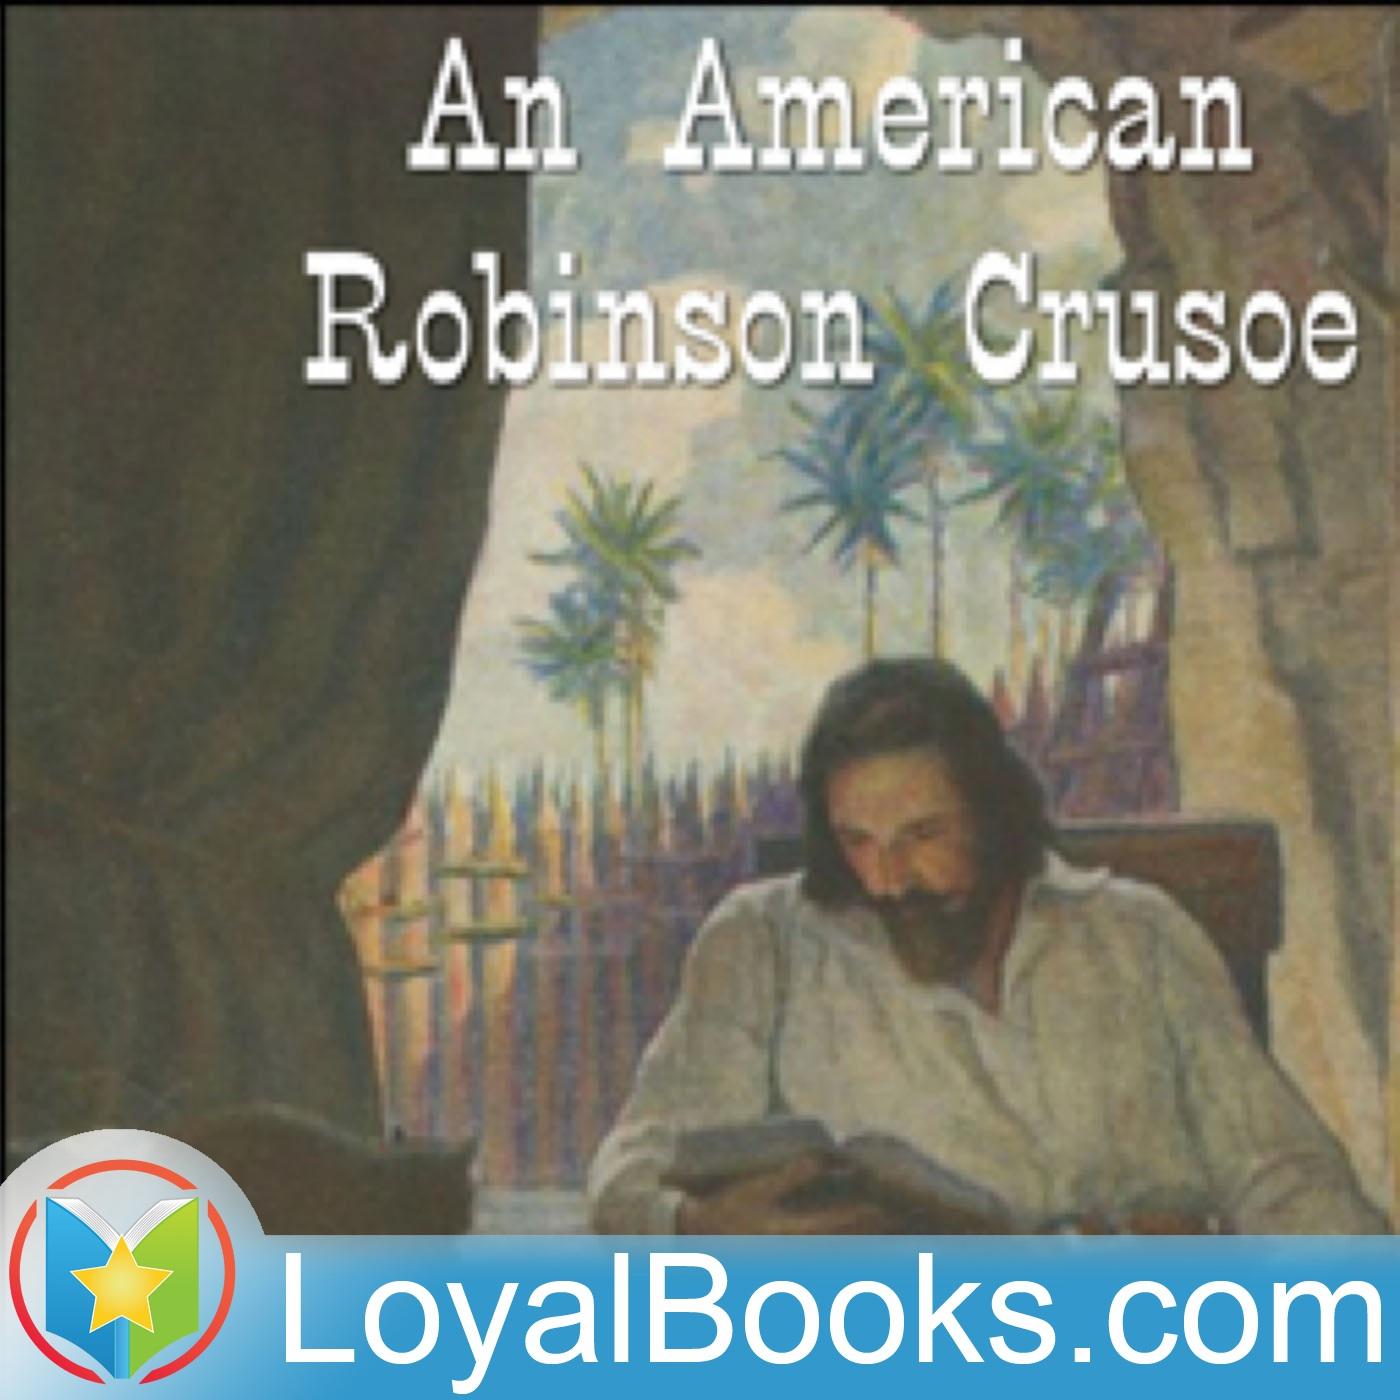 <![CDATA[An American Robinson Crusoe by Samuel B. Allison]]>